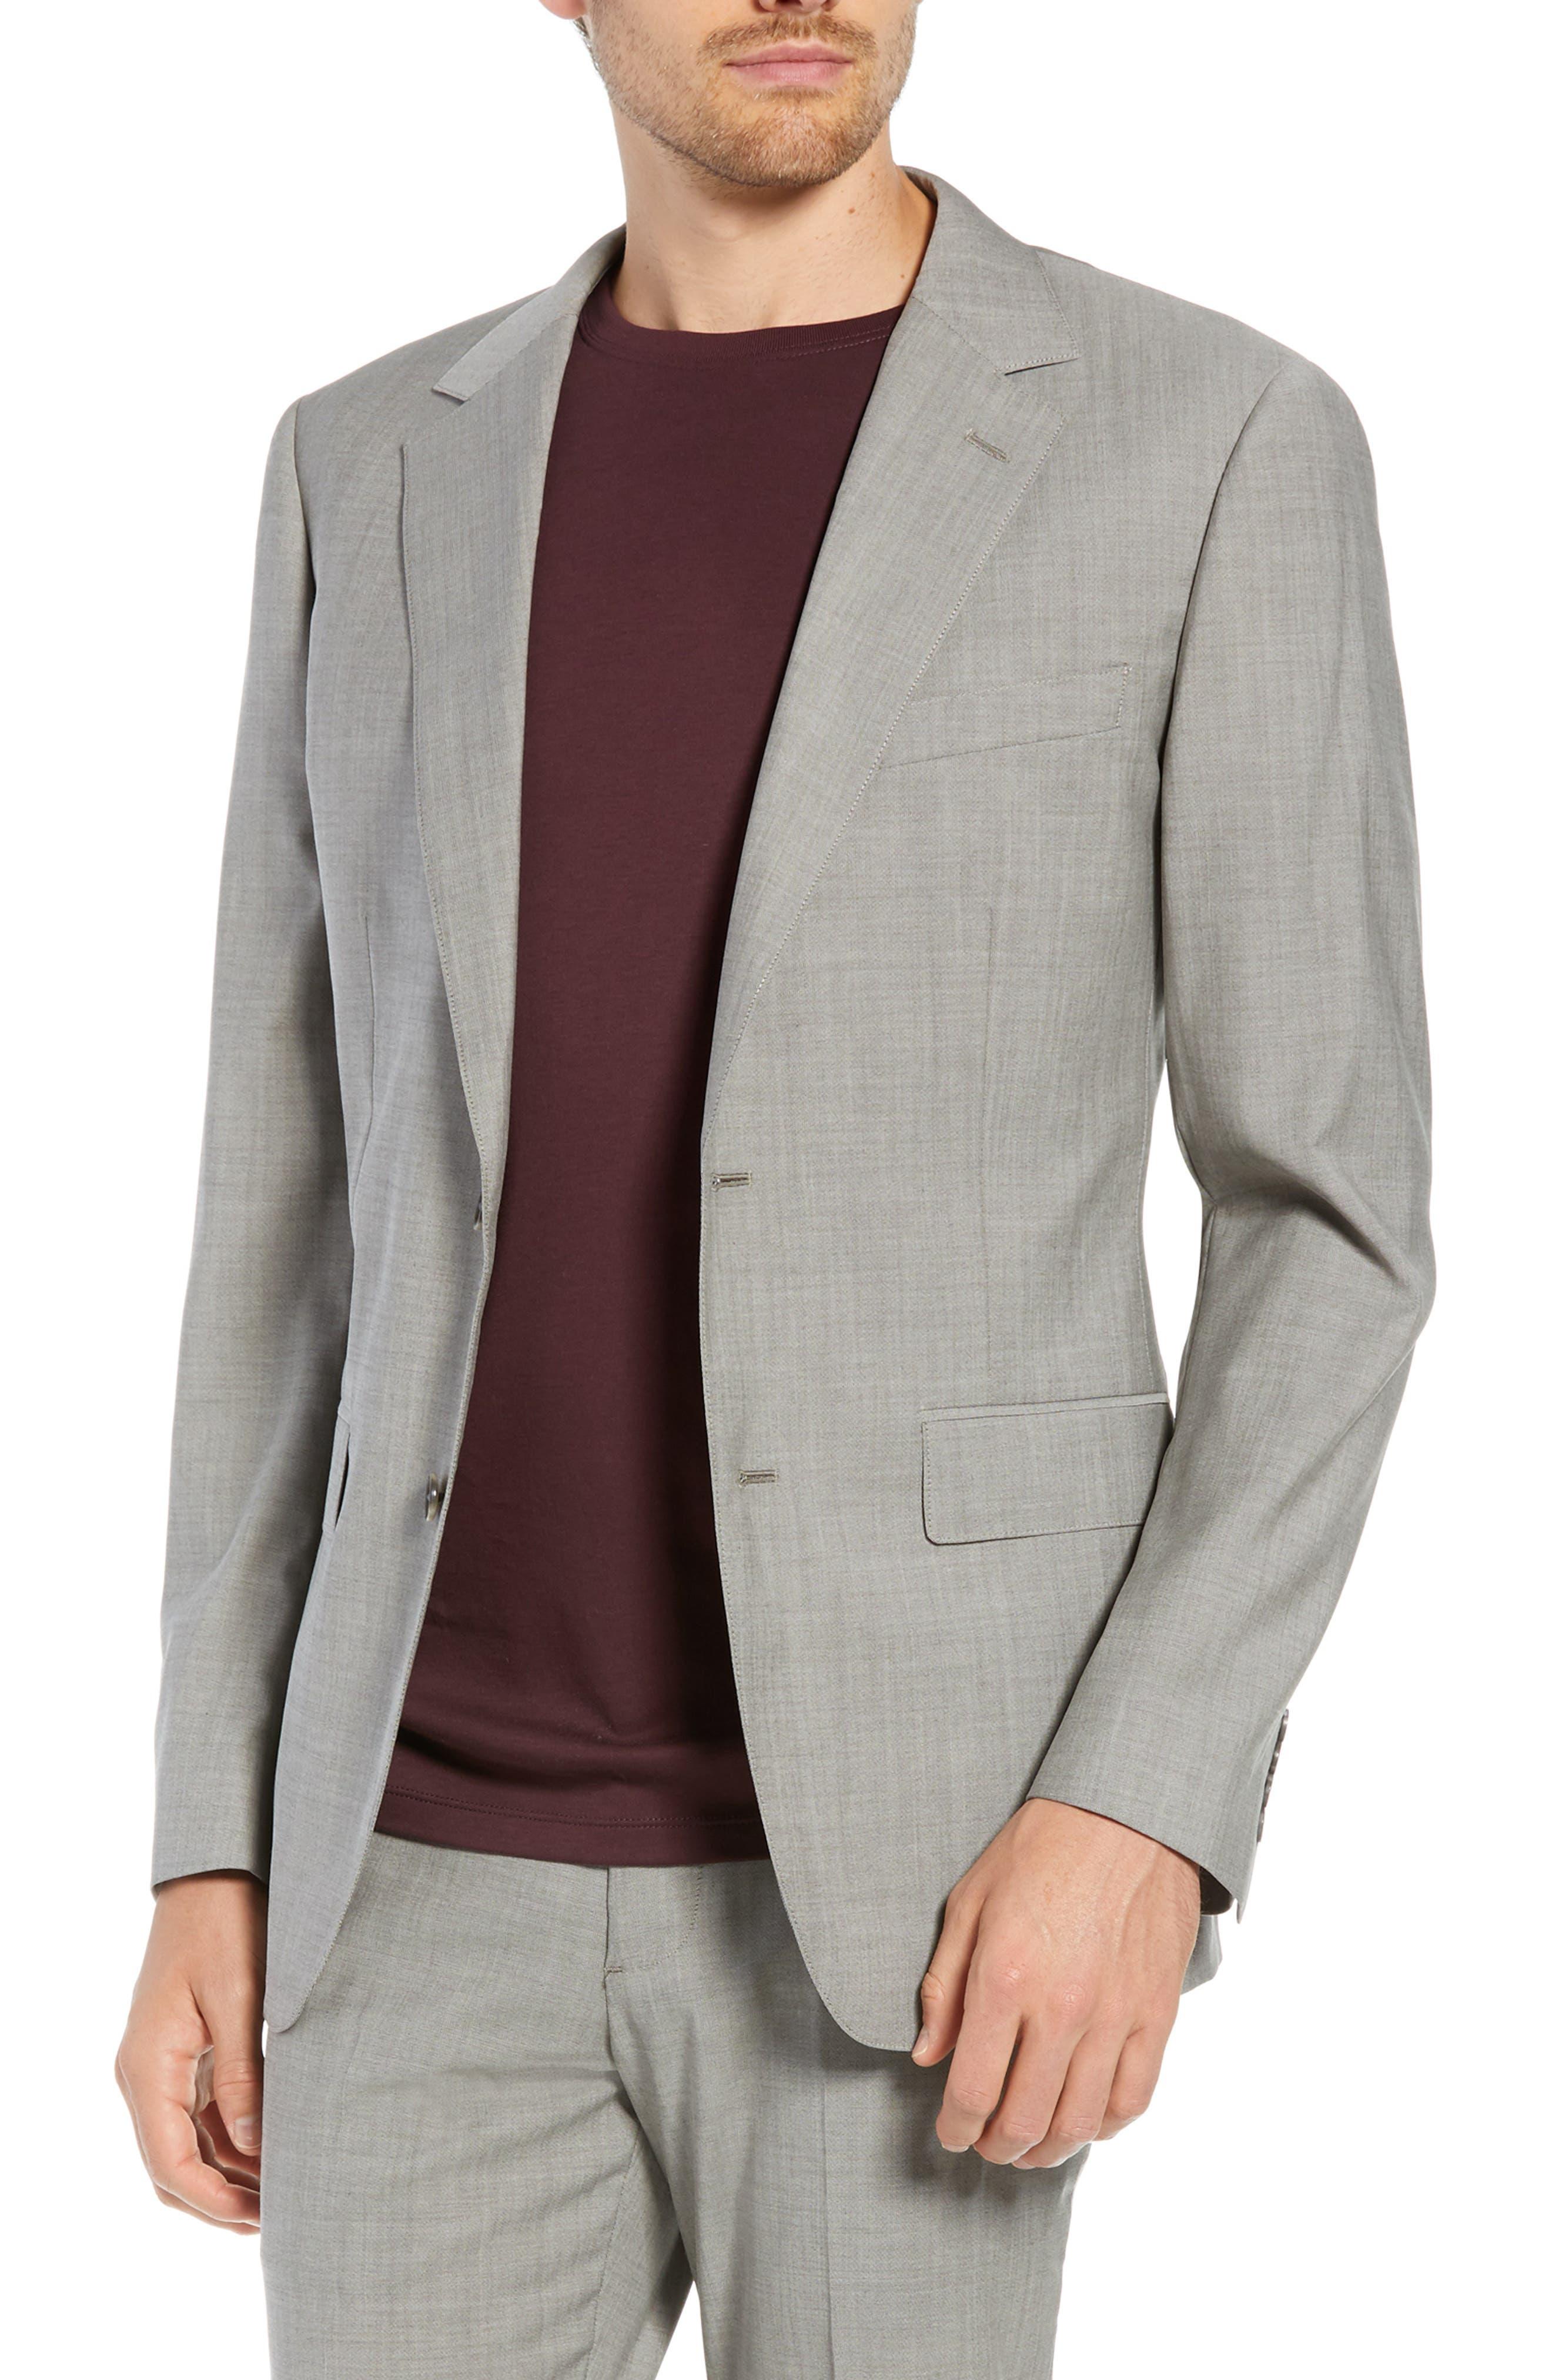 Jetsetter Slim Fit Stretch Wool Blazer,                             Main thumbnail 1, color,                             LIGHT BROWN